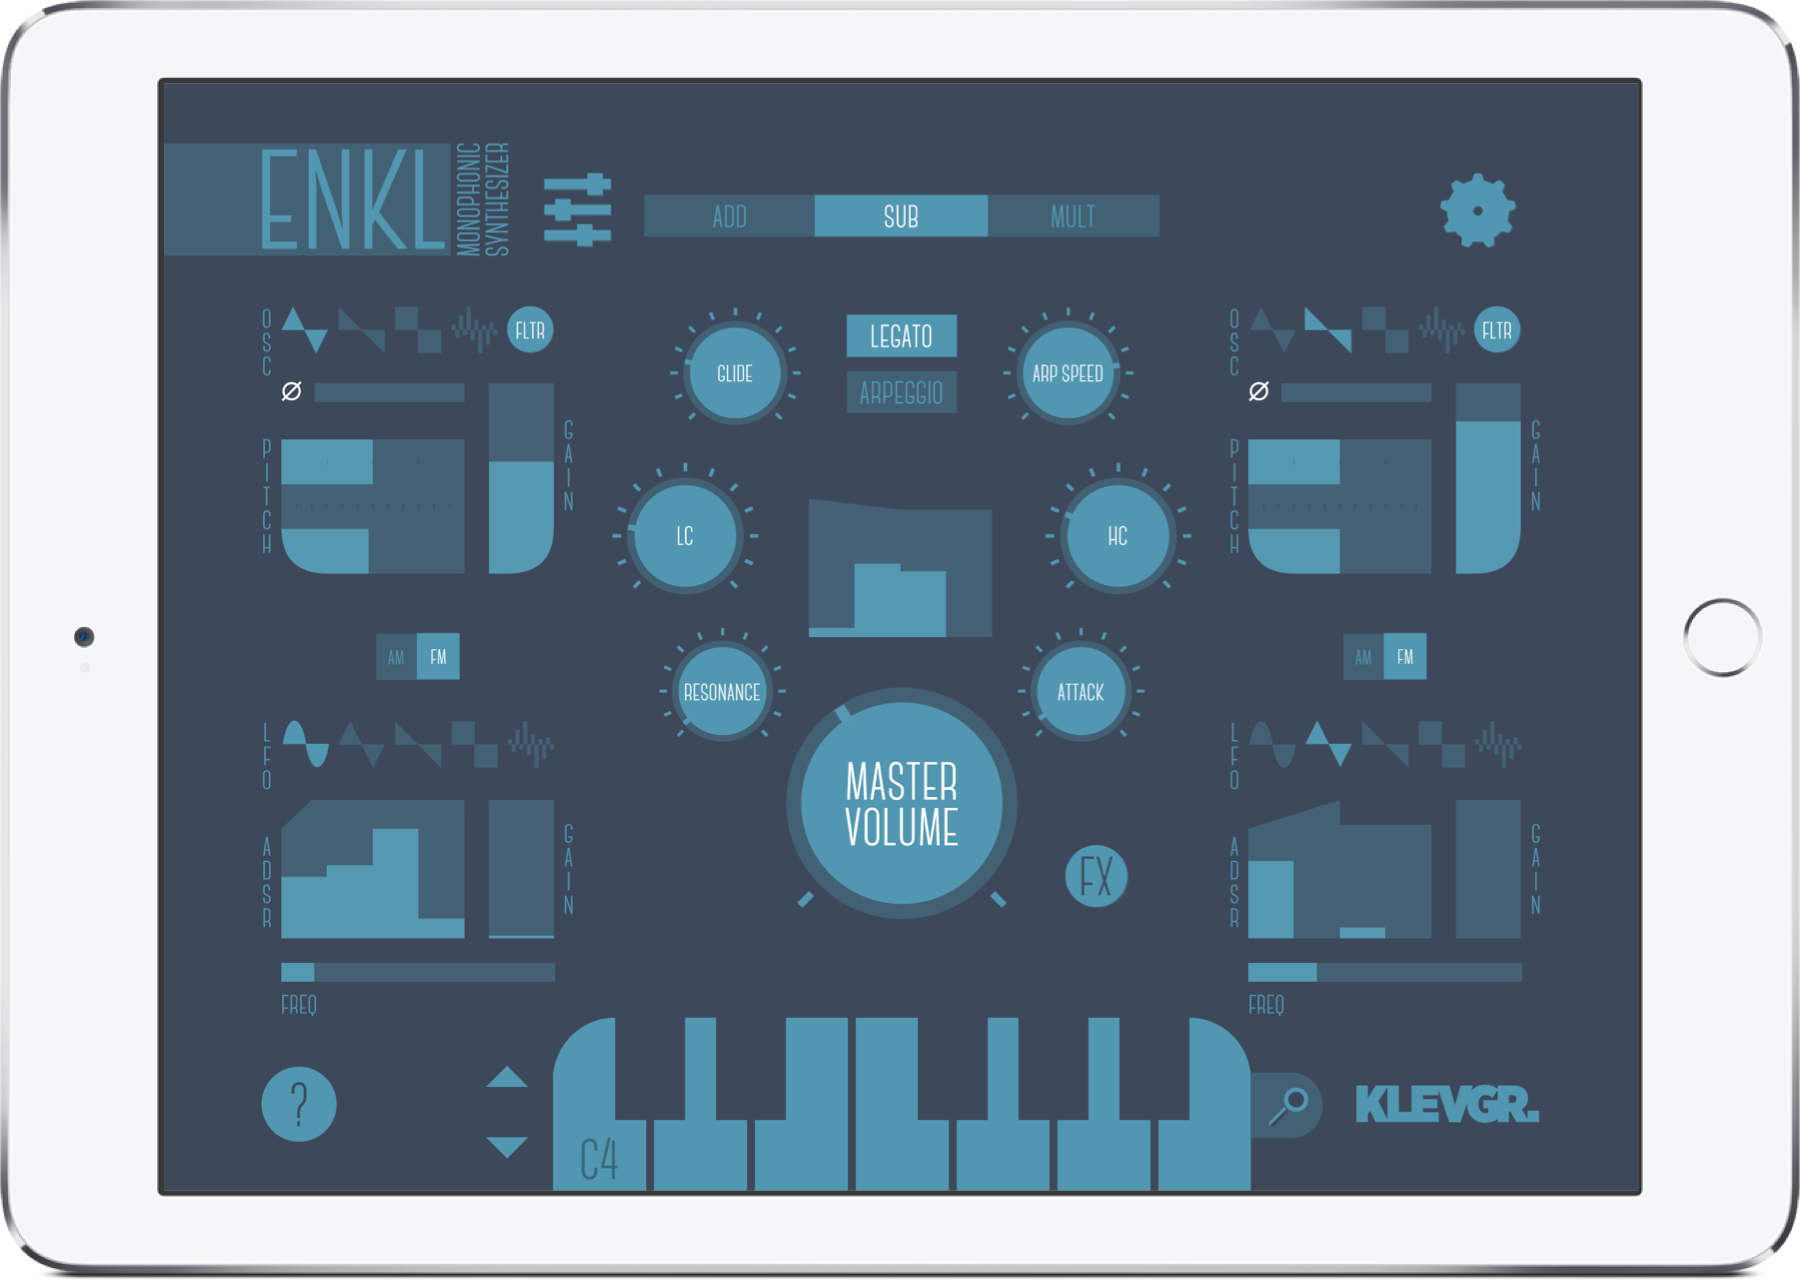 Enkl monophonic synthesizer